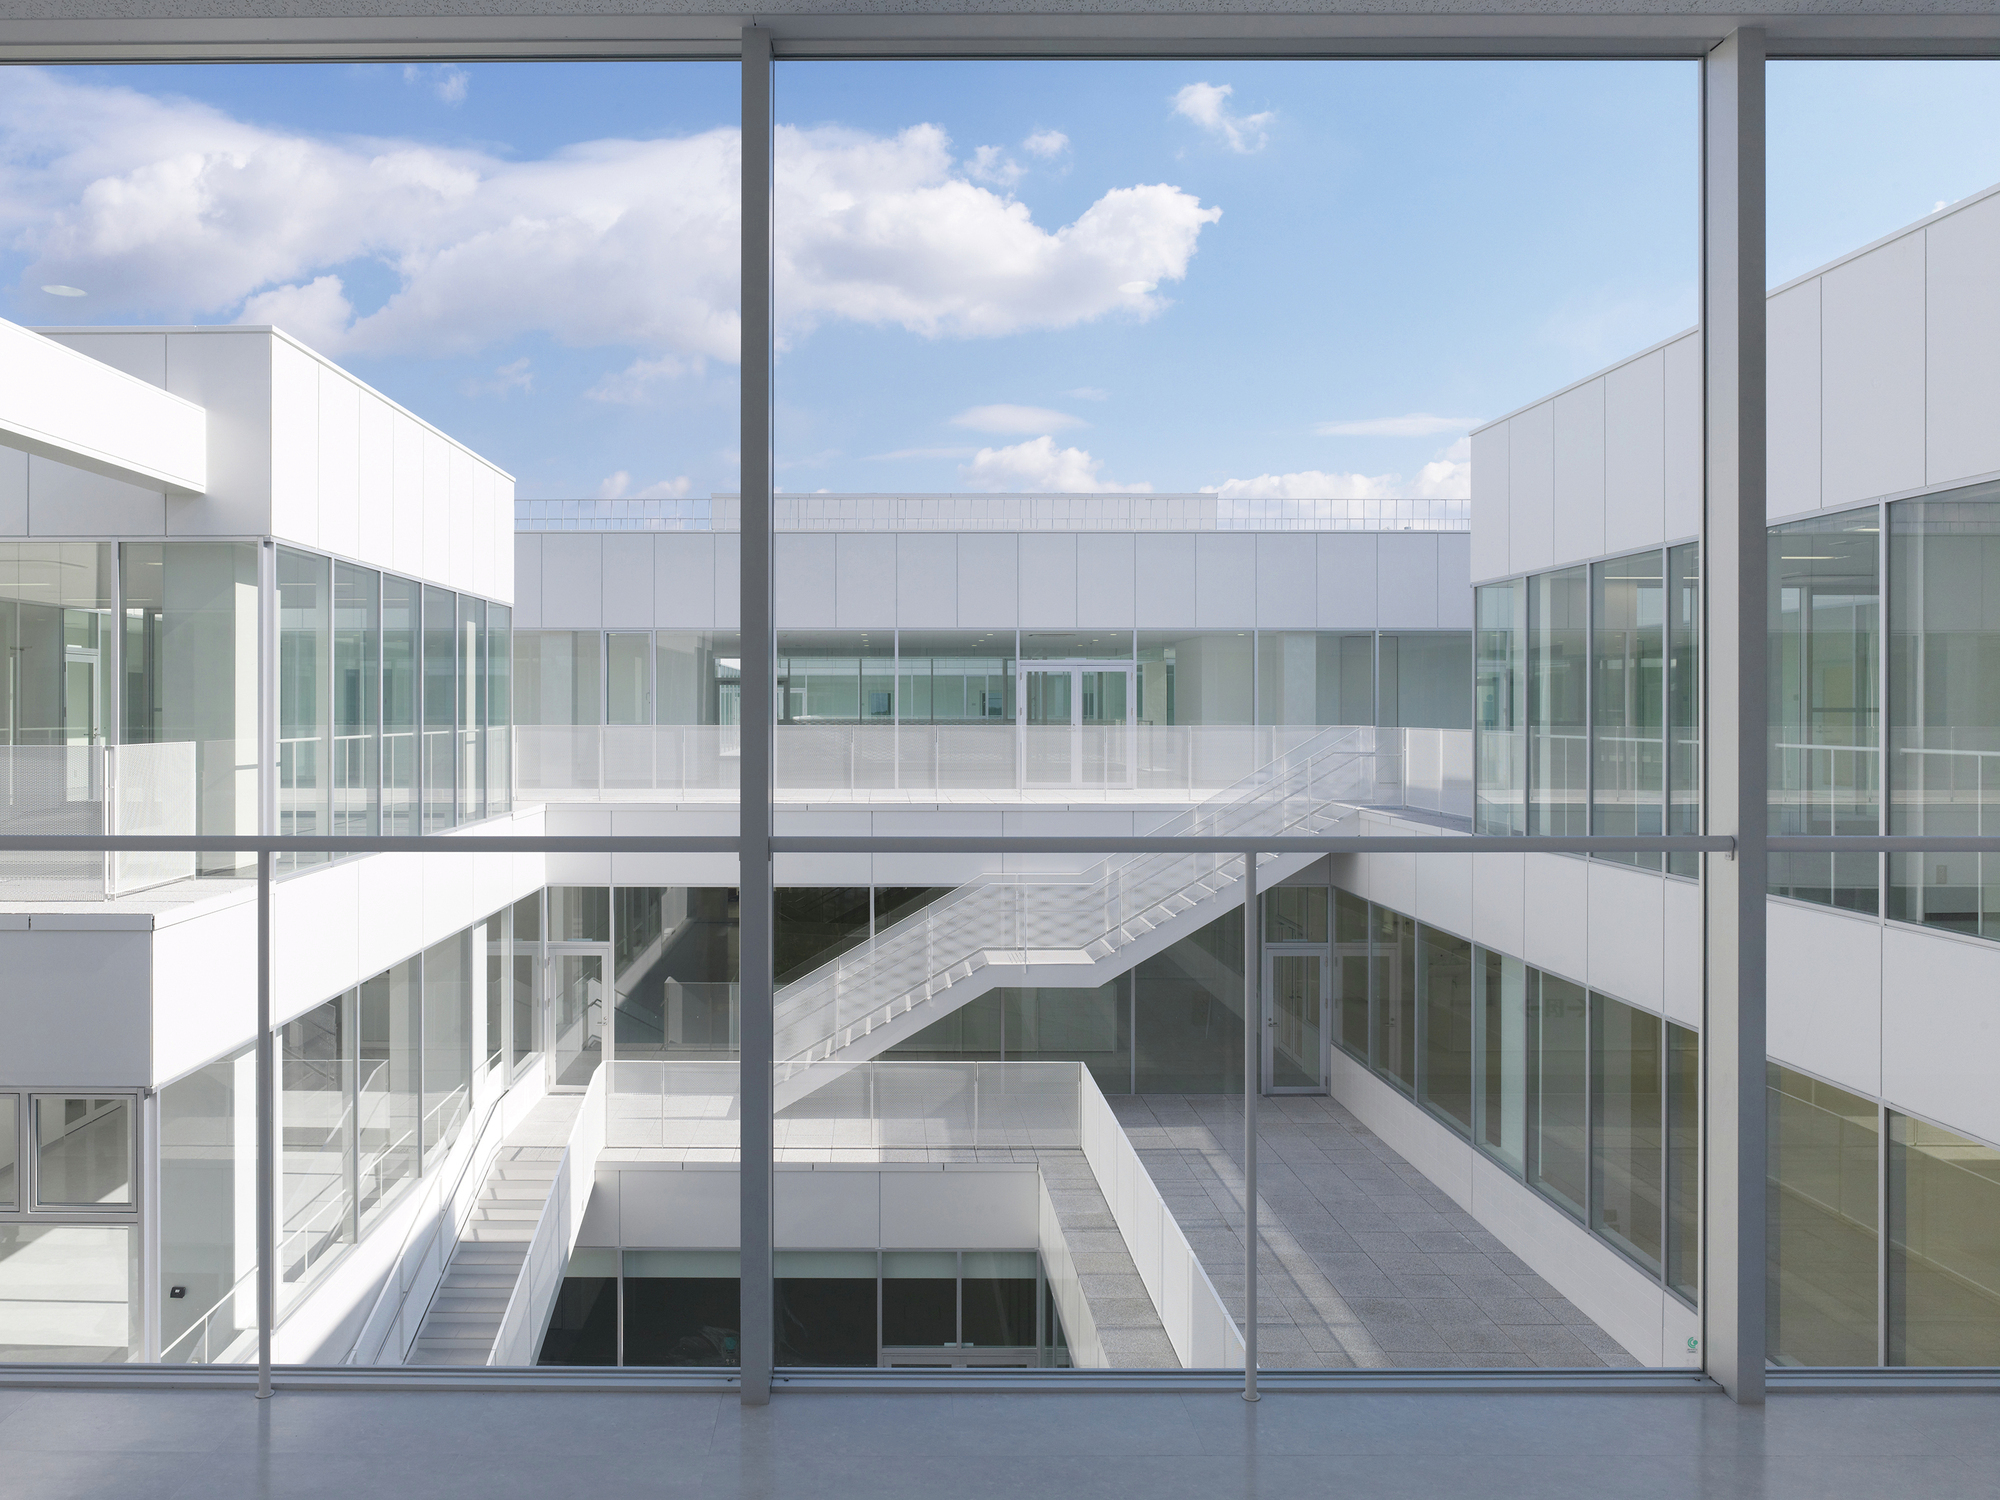 Setsunan university hirakata ishimoto architectural for Architecture and engineering firms